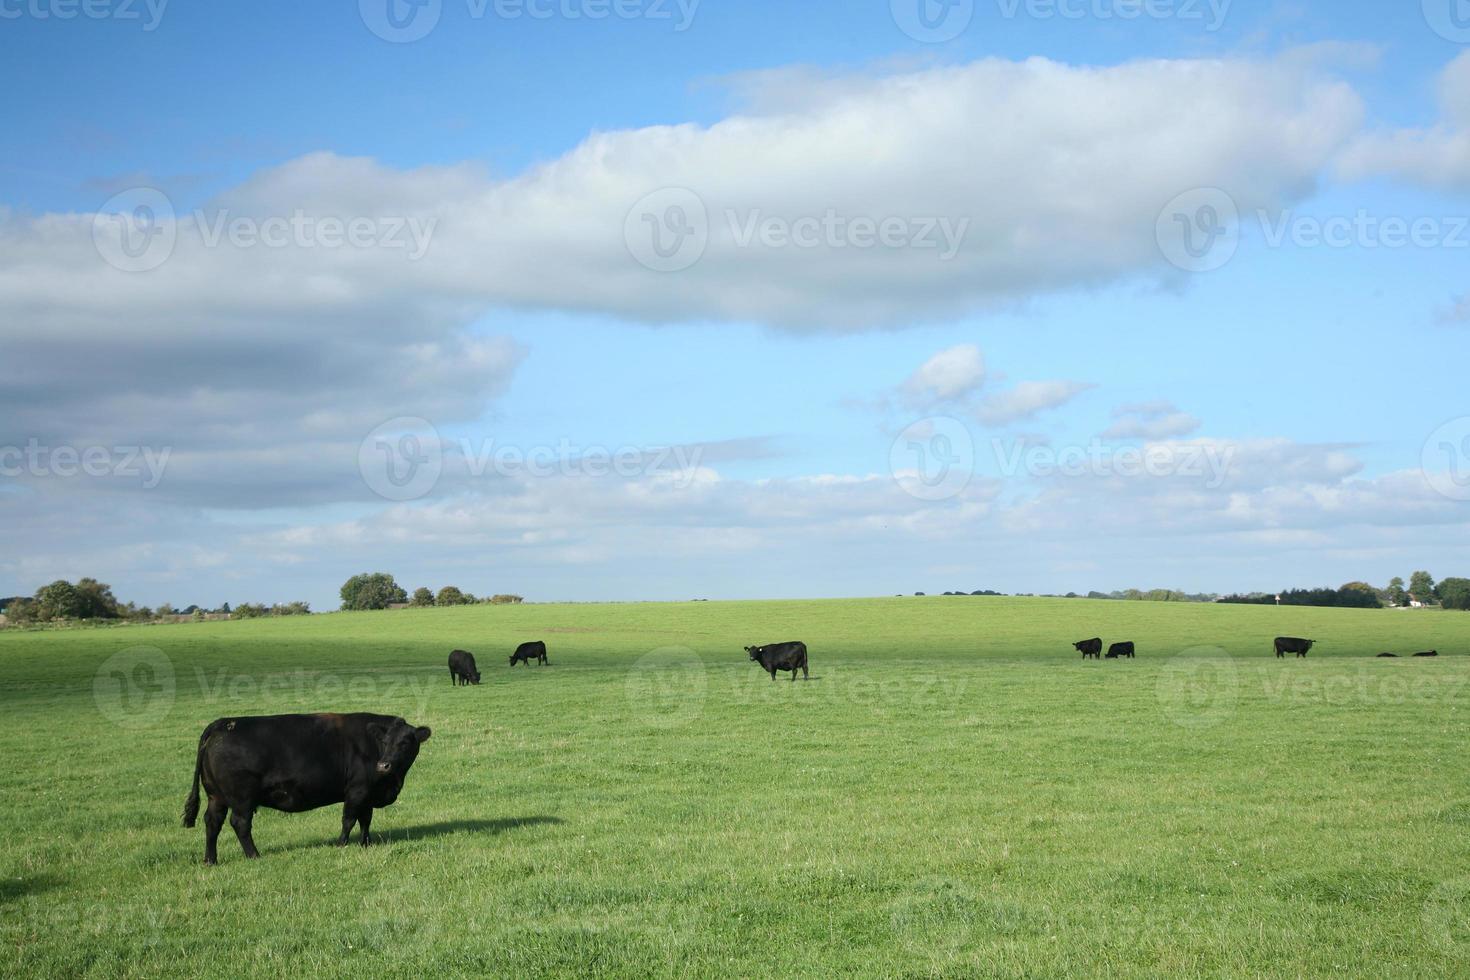 deense koeien foto